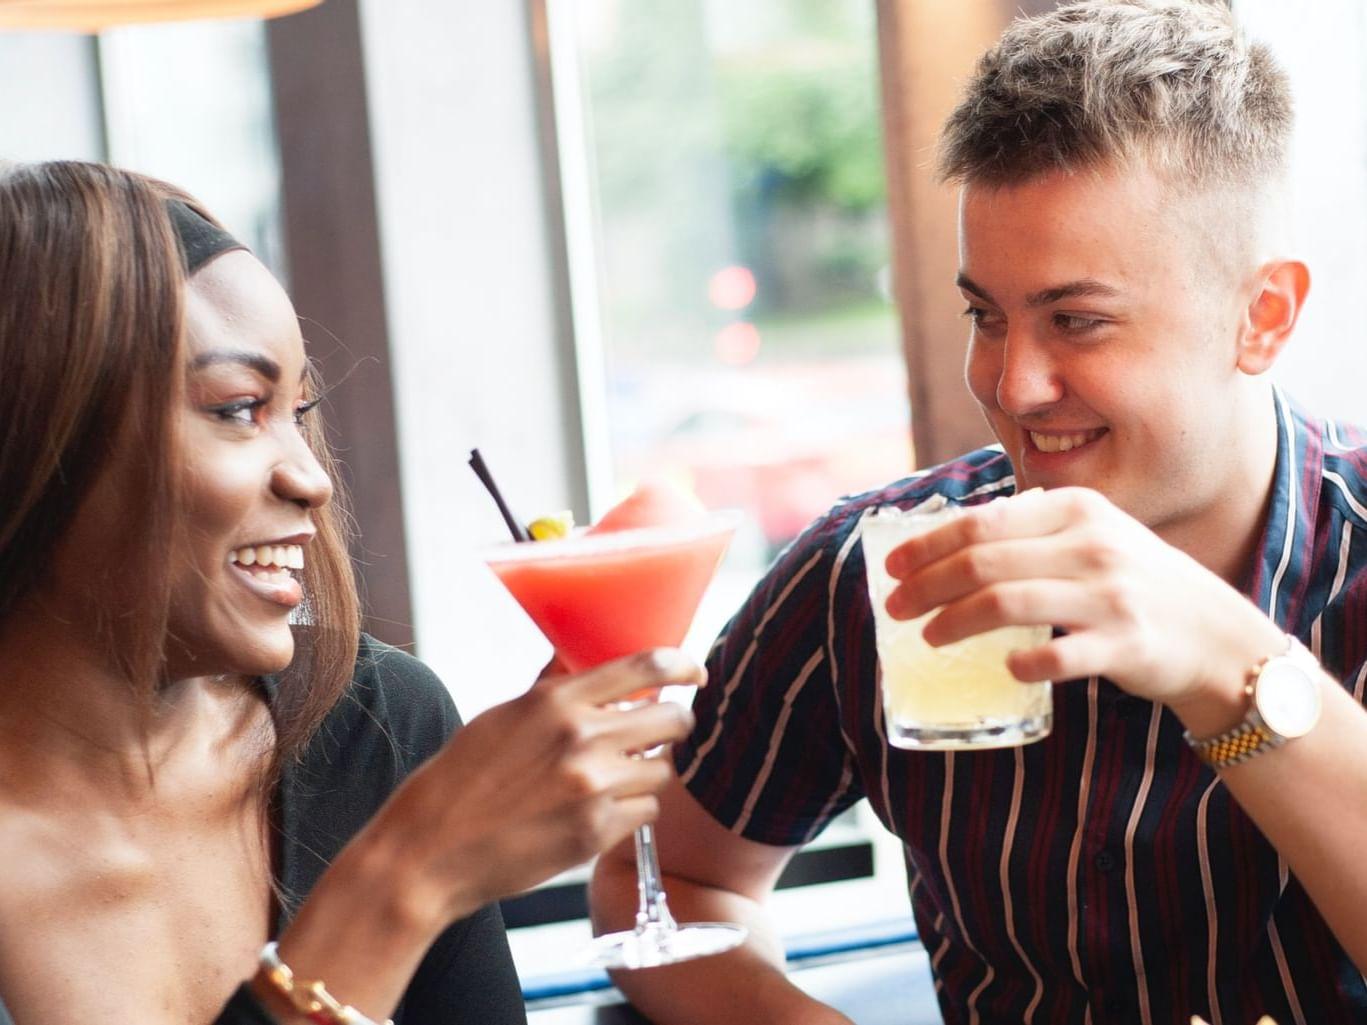 A couple having a fresh juice